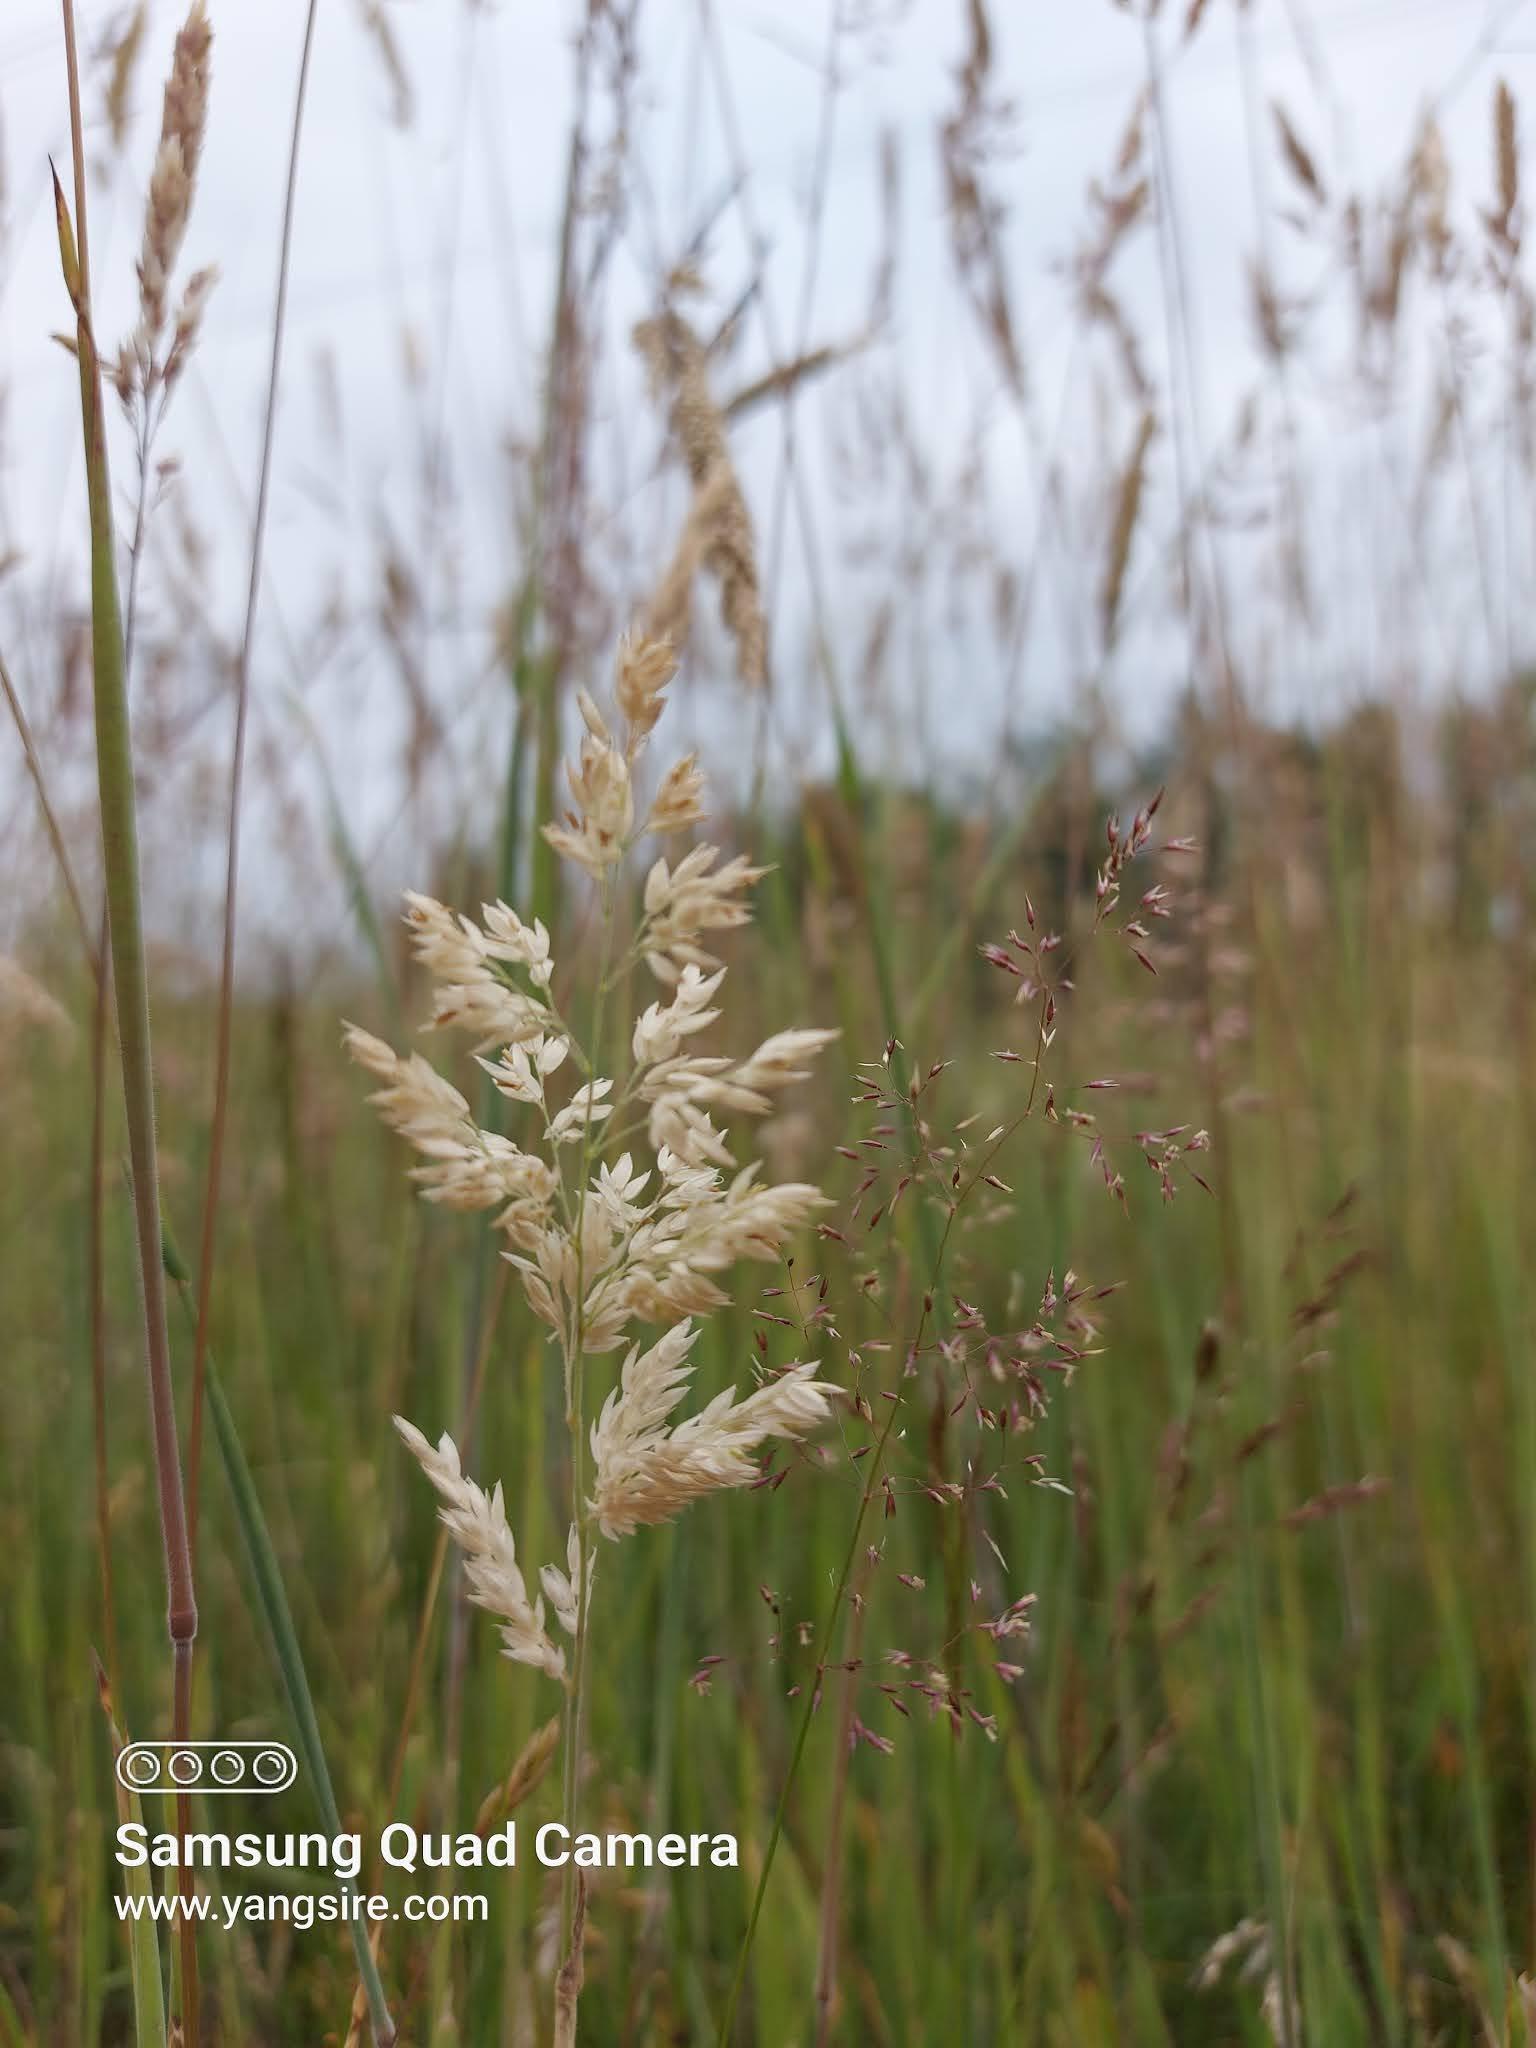 Free grass field image